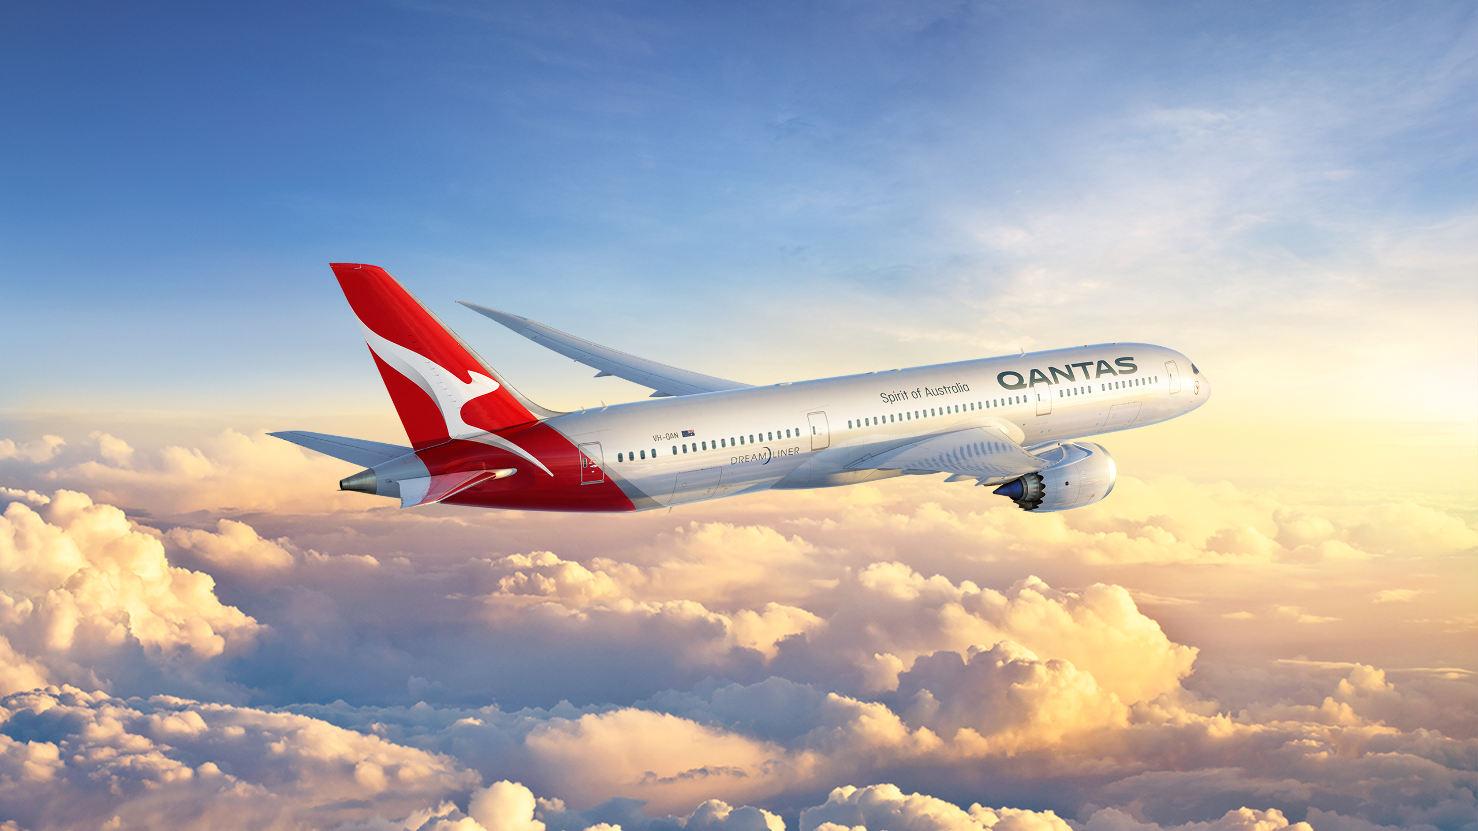 Qantas to fly non-stop Perth to London